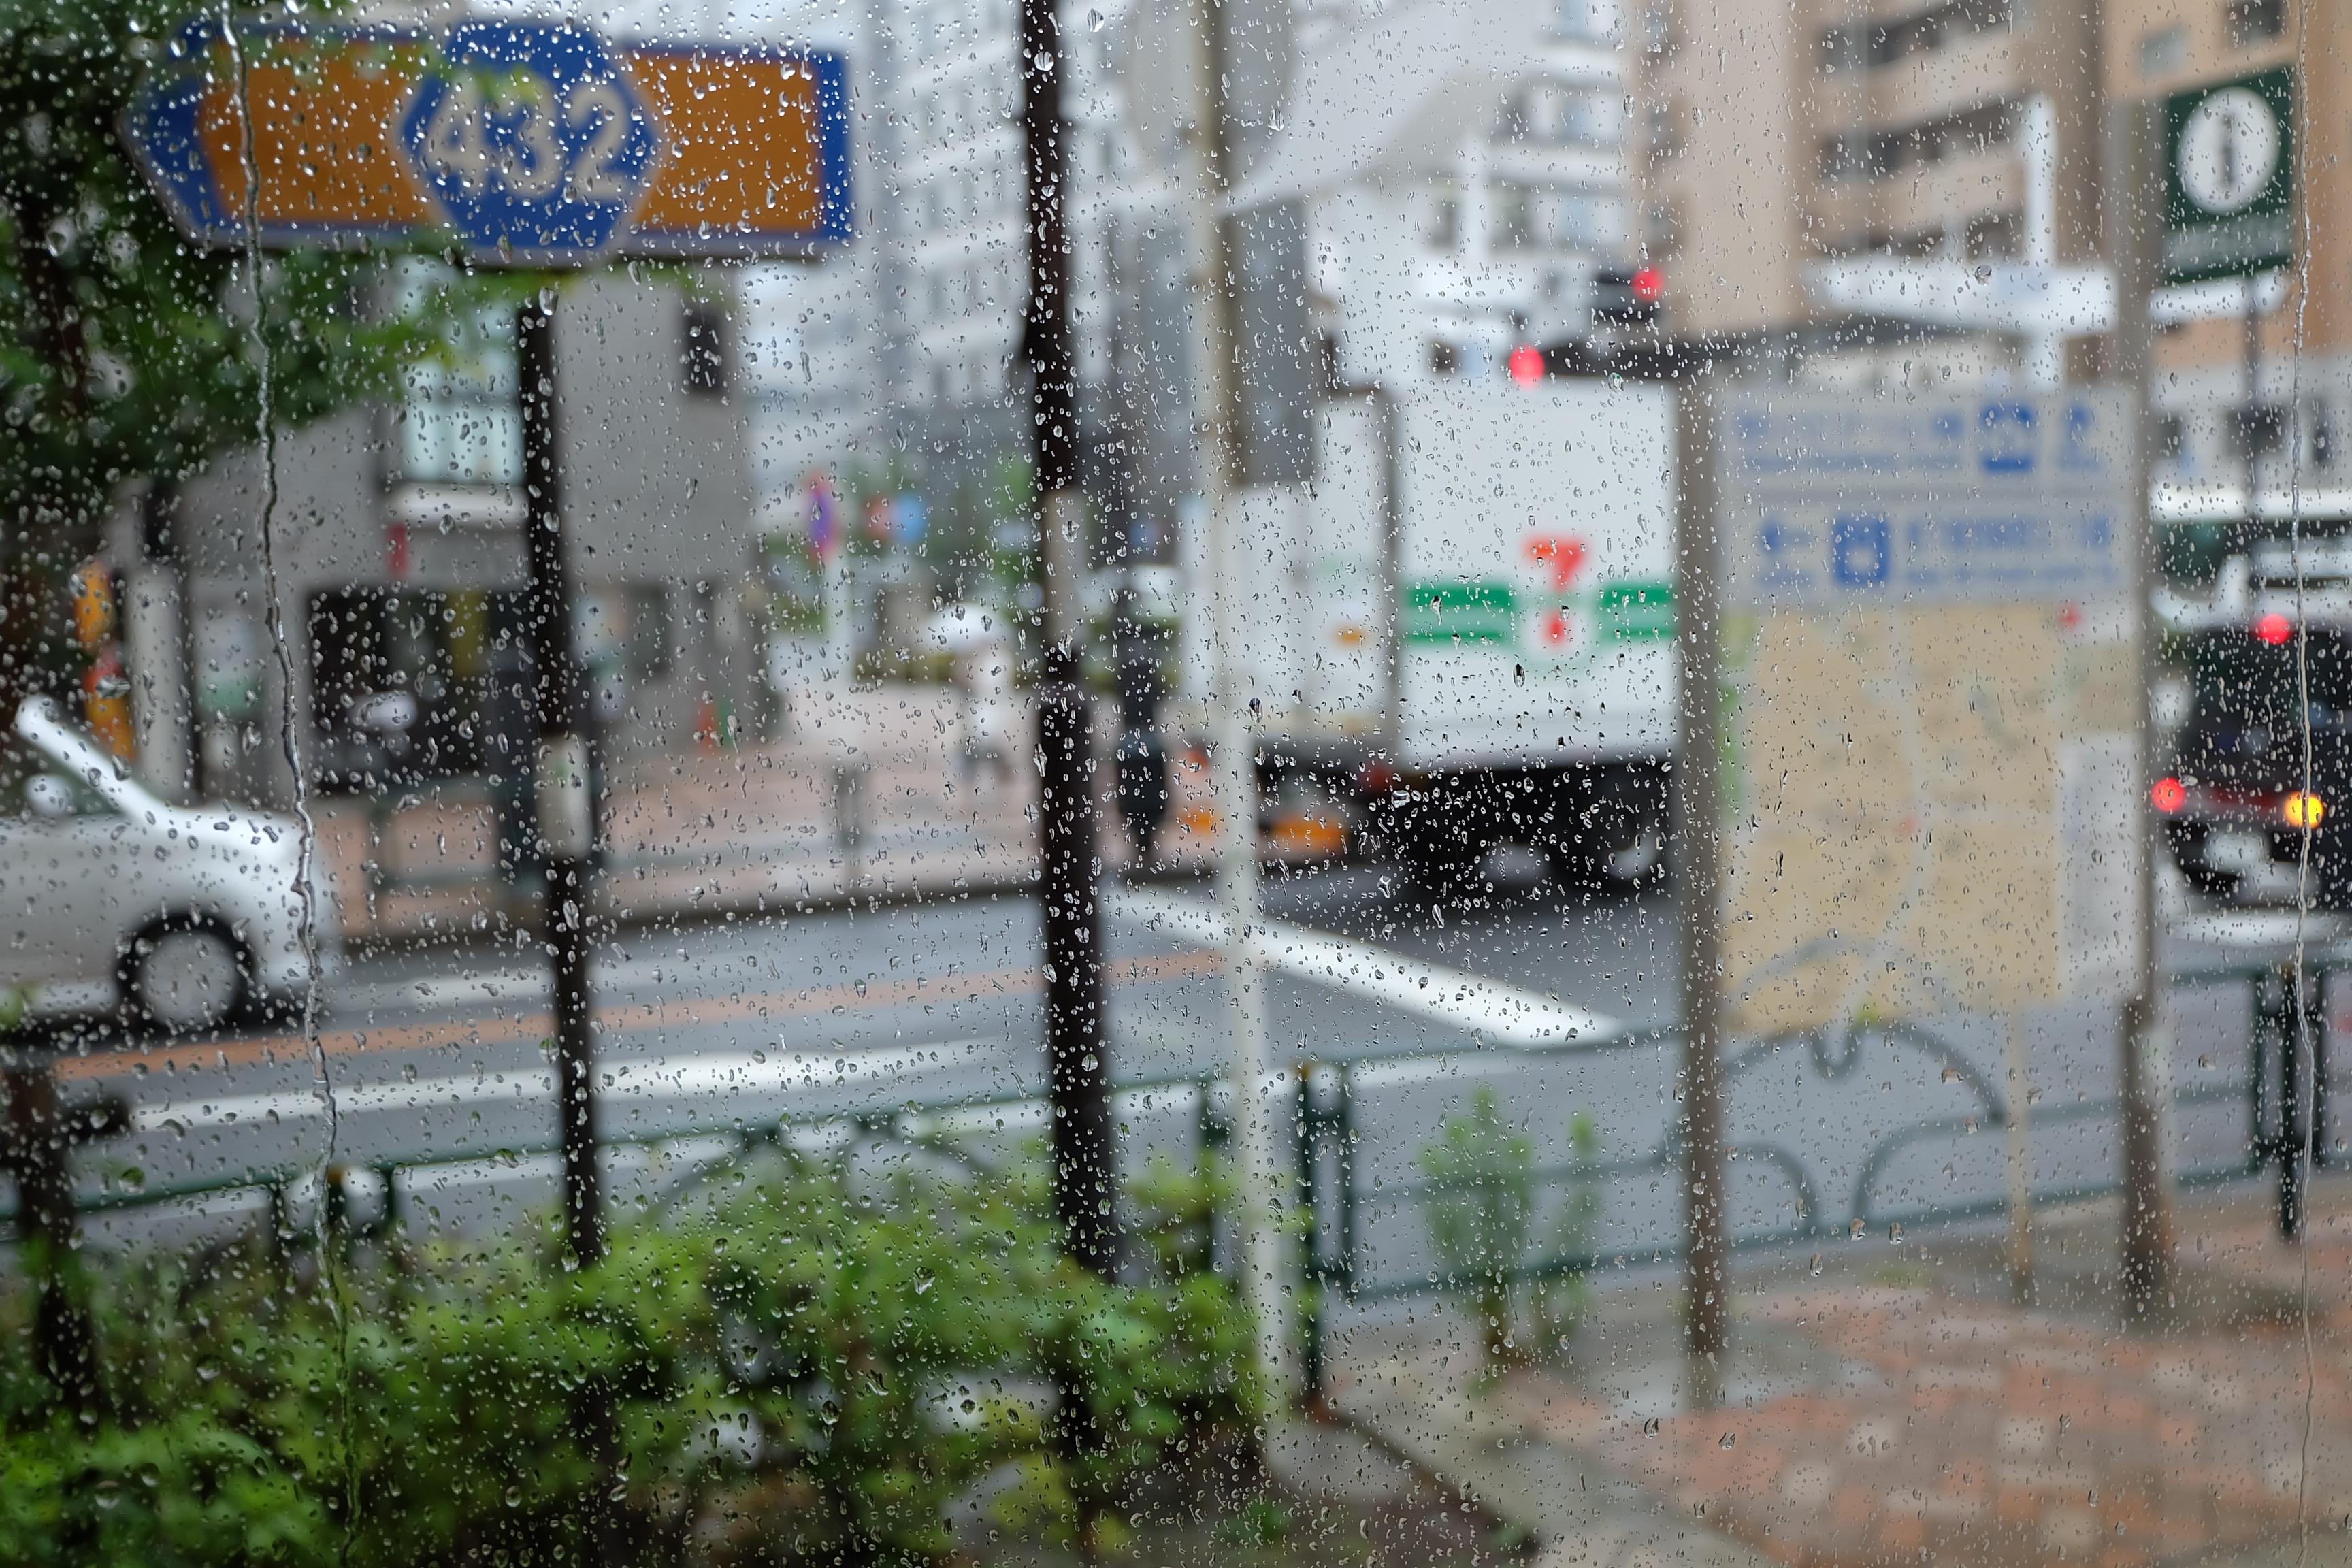 Rain on a window at Counterpart Coffee Gallery Nishi Shinjuku Tokyo Japan